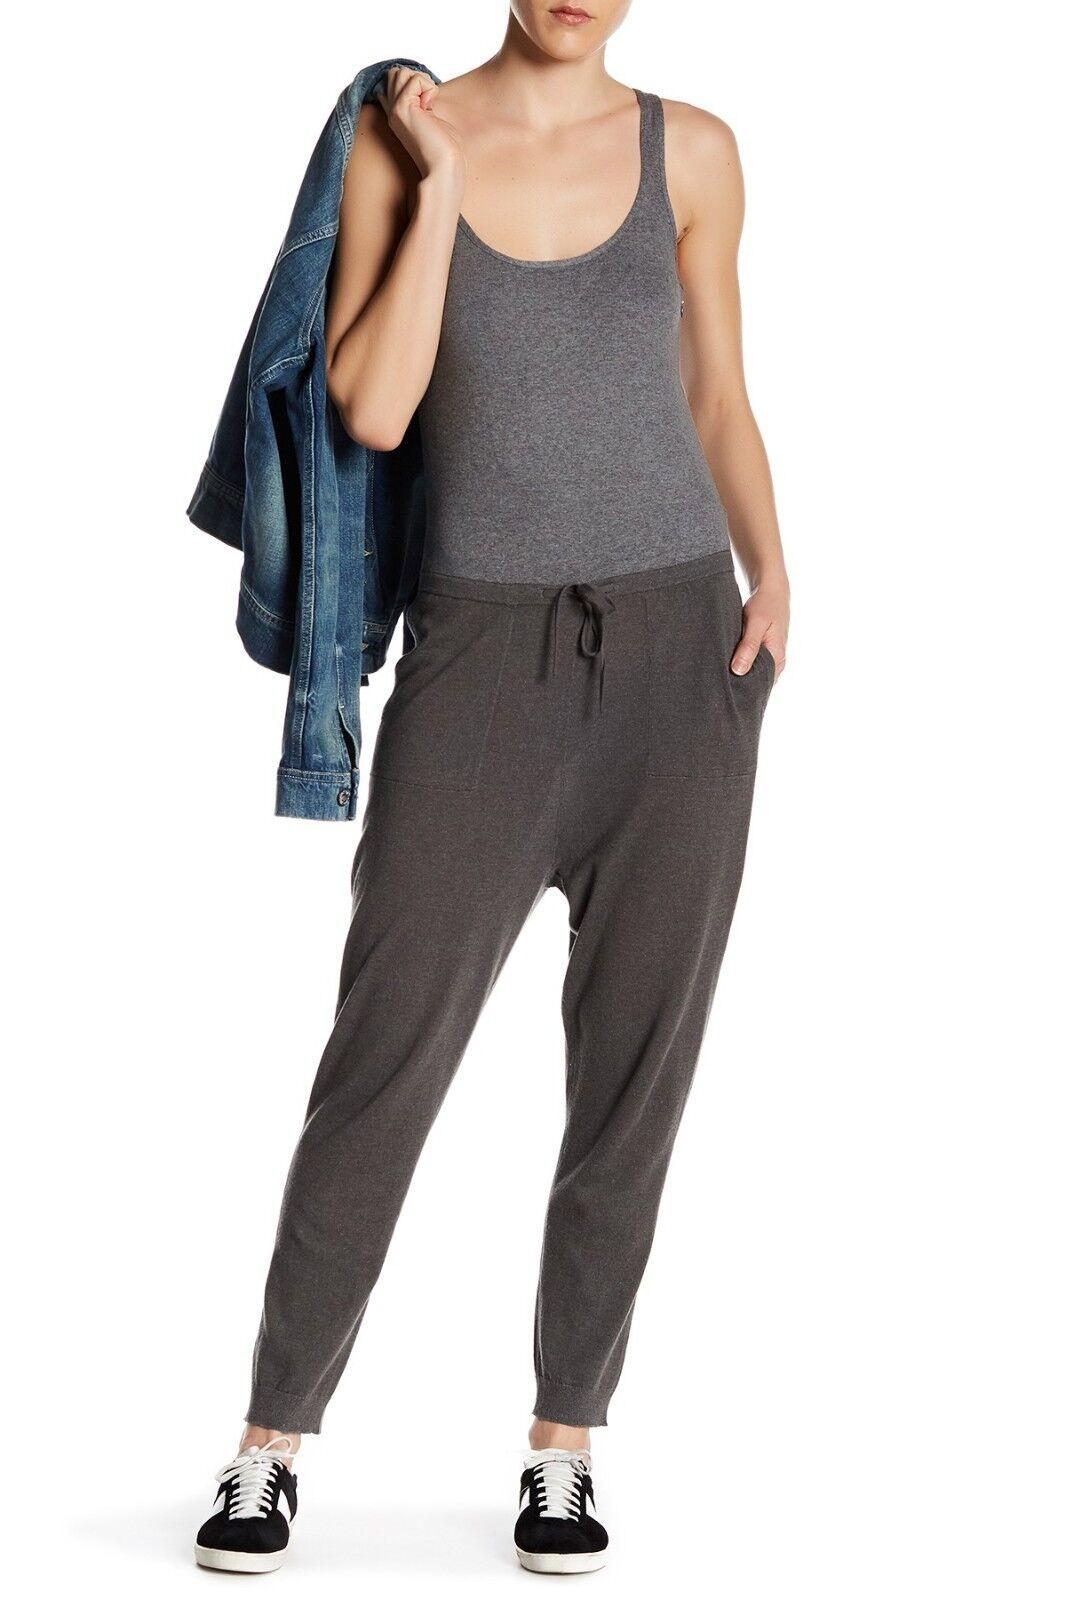 Inhabit Shale Drawstring Jumpsuit Size Medium Originally  319.00